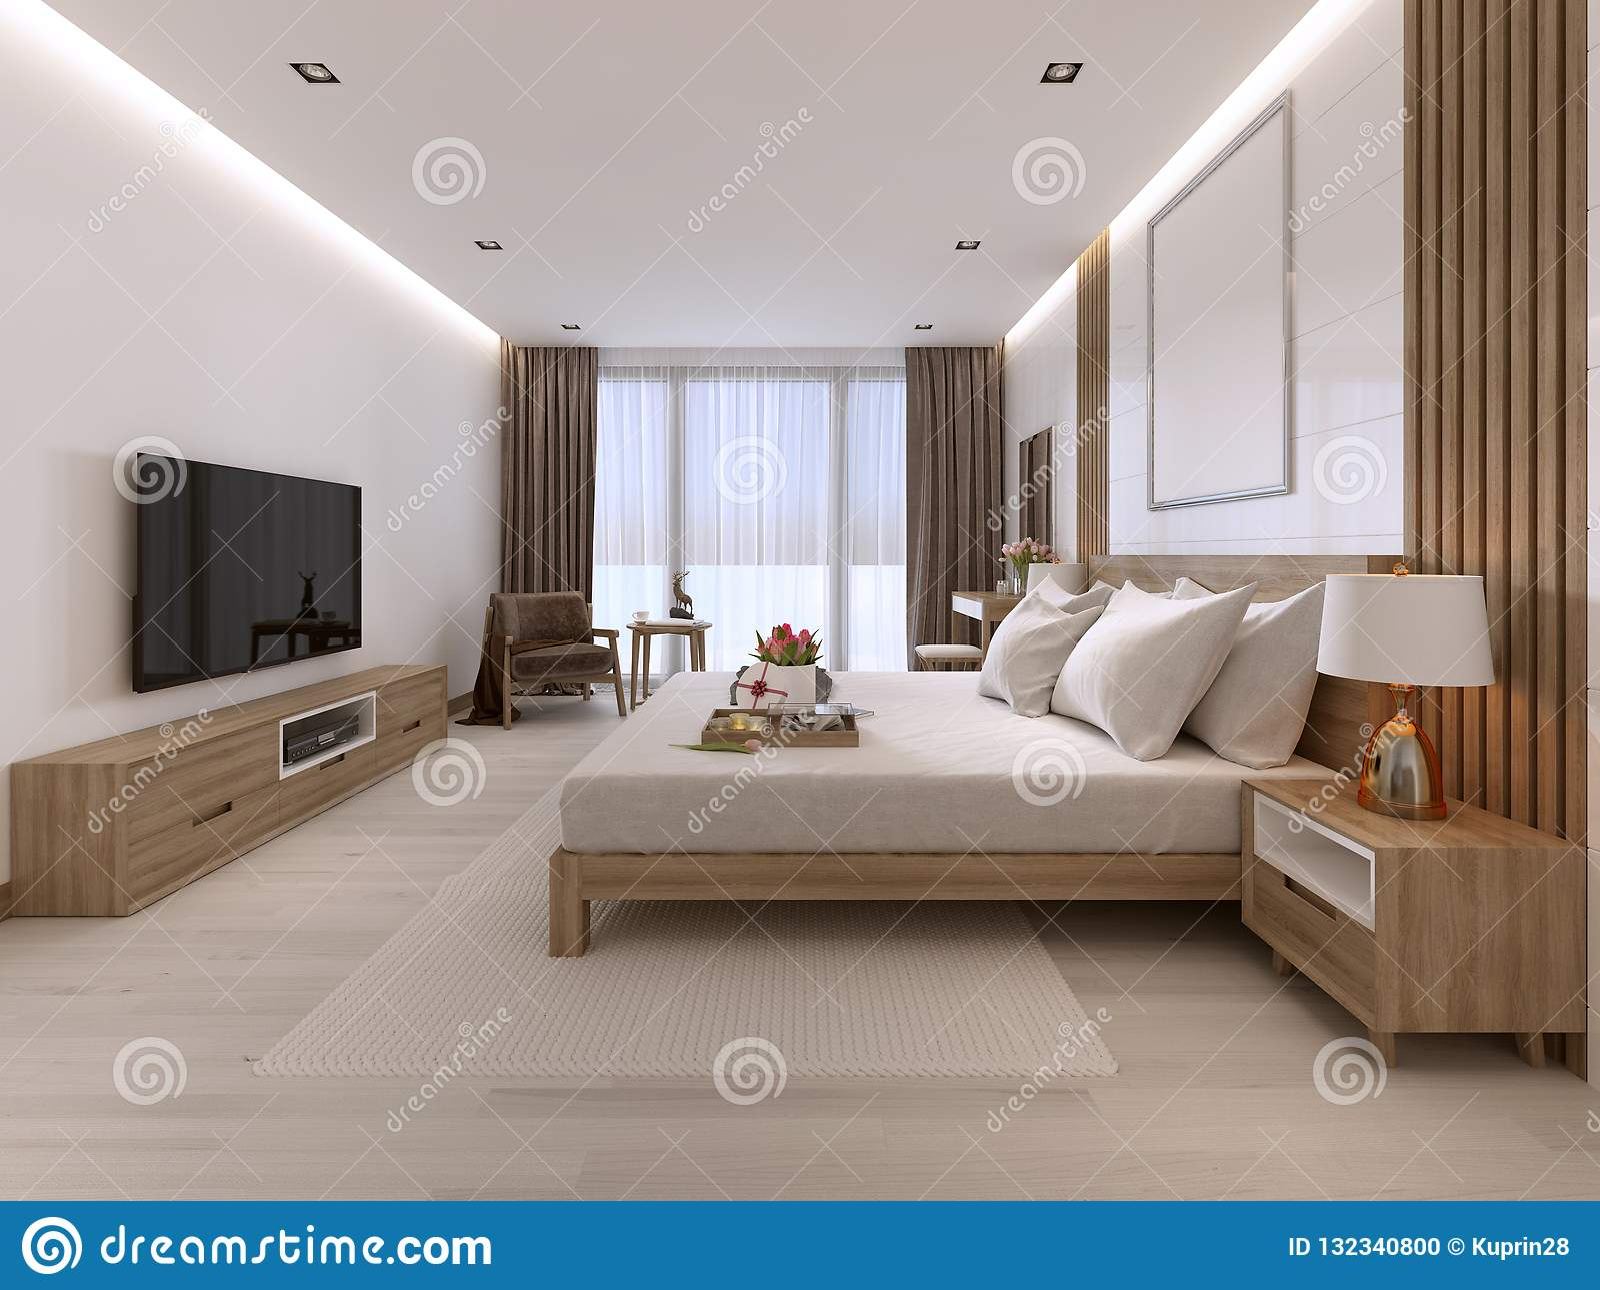 Modern Light Bedroom With Wooden Furniture In Scandinavian Style Stock Illustration Illustration Of Idea Bedroom 132340800